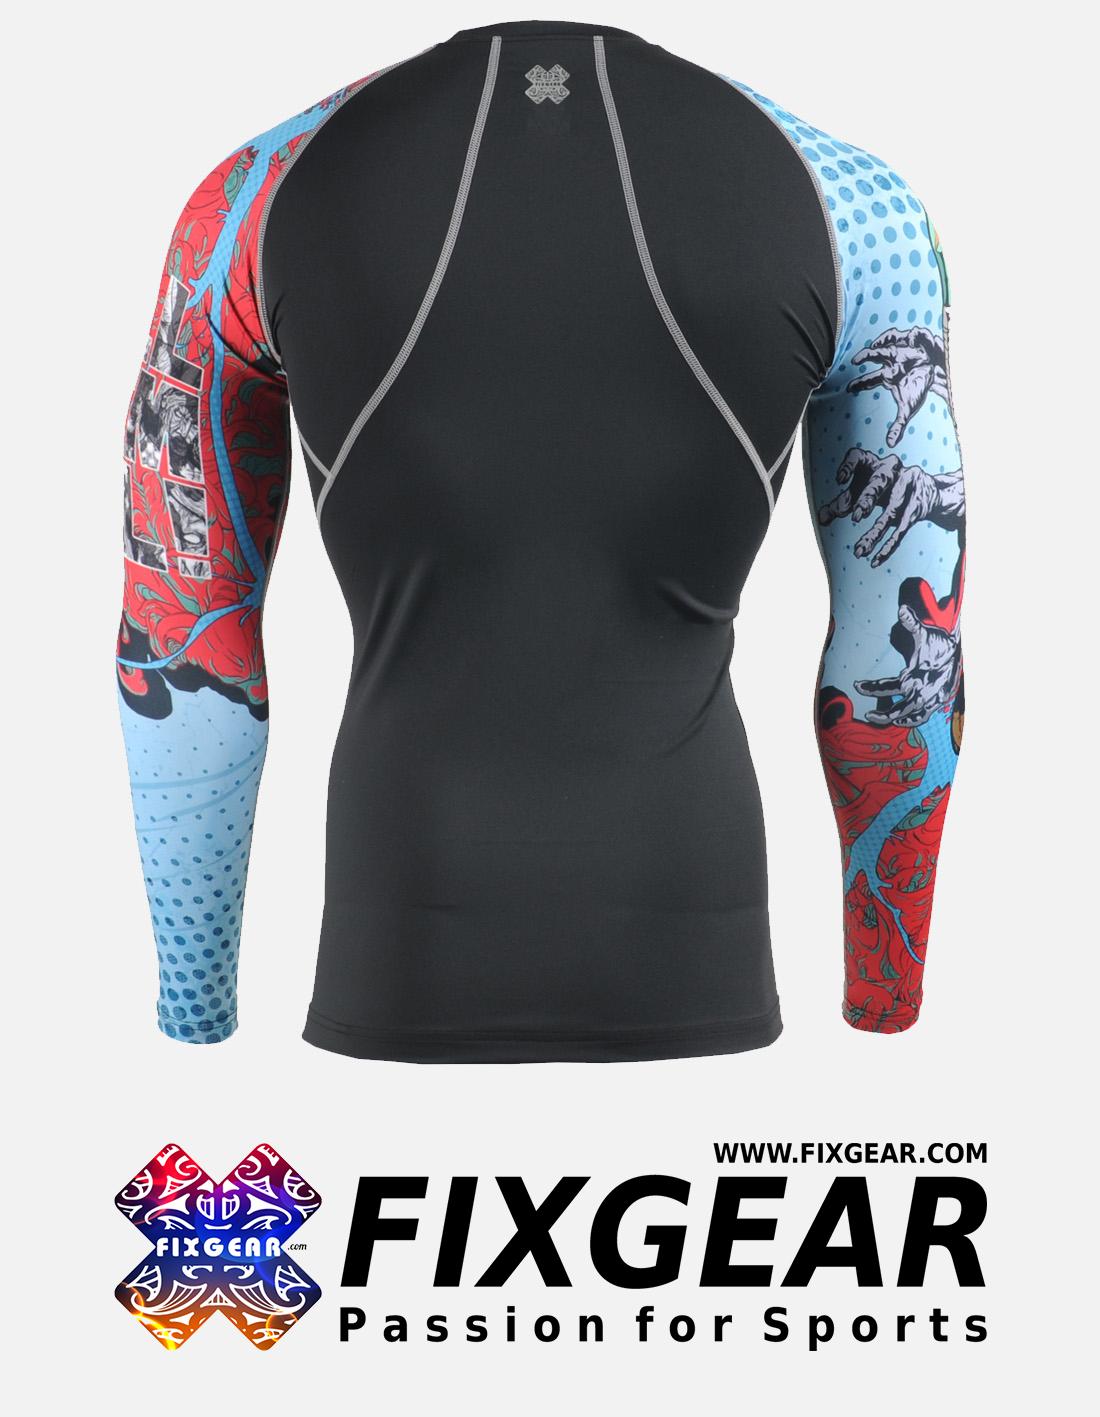 FIXGEAR CPD-B77 Compression Base Layer Shirt